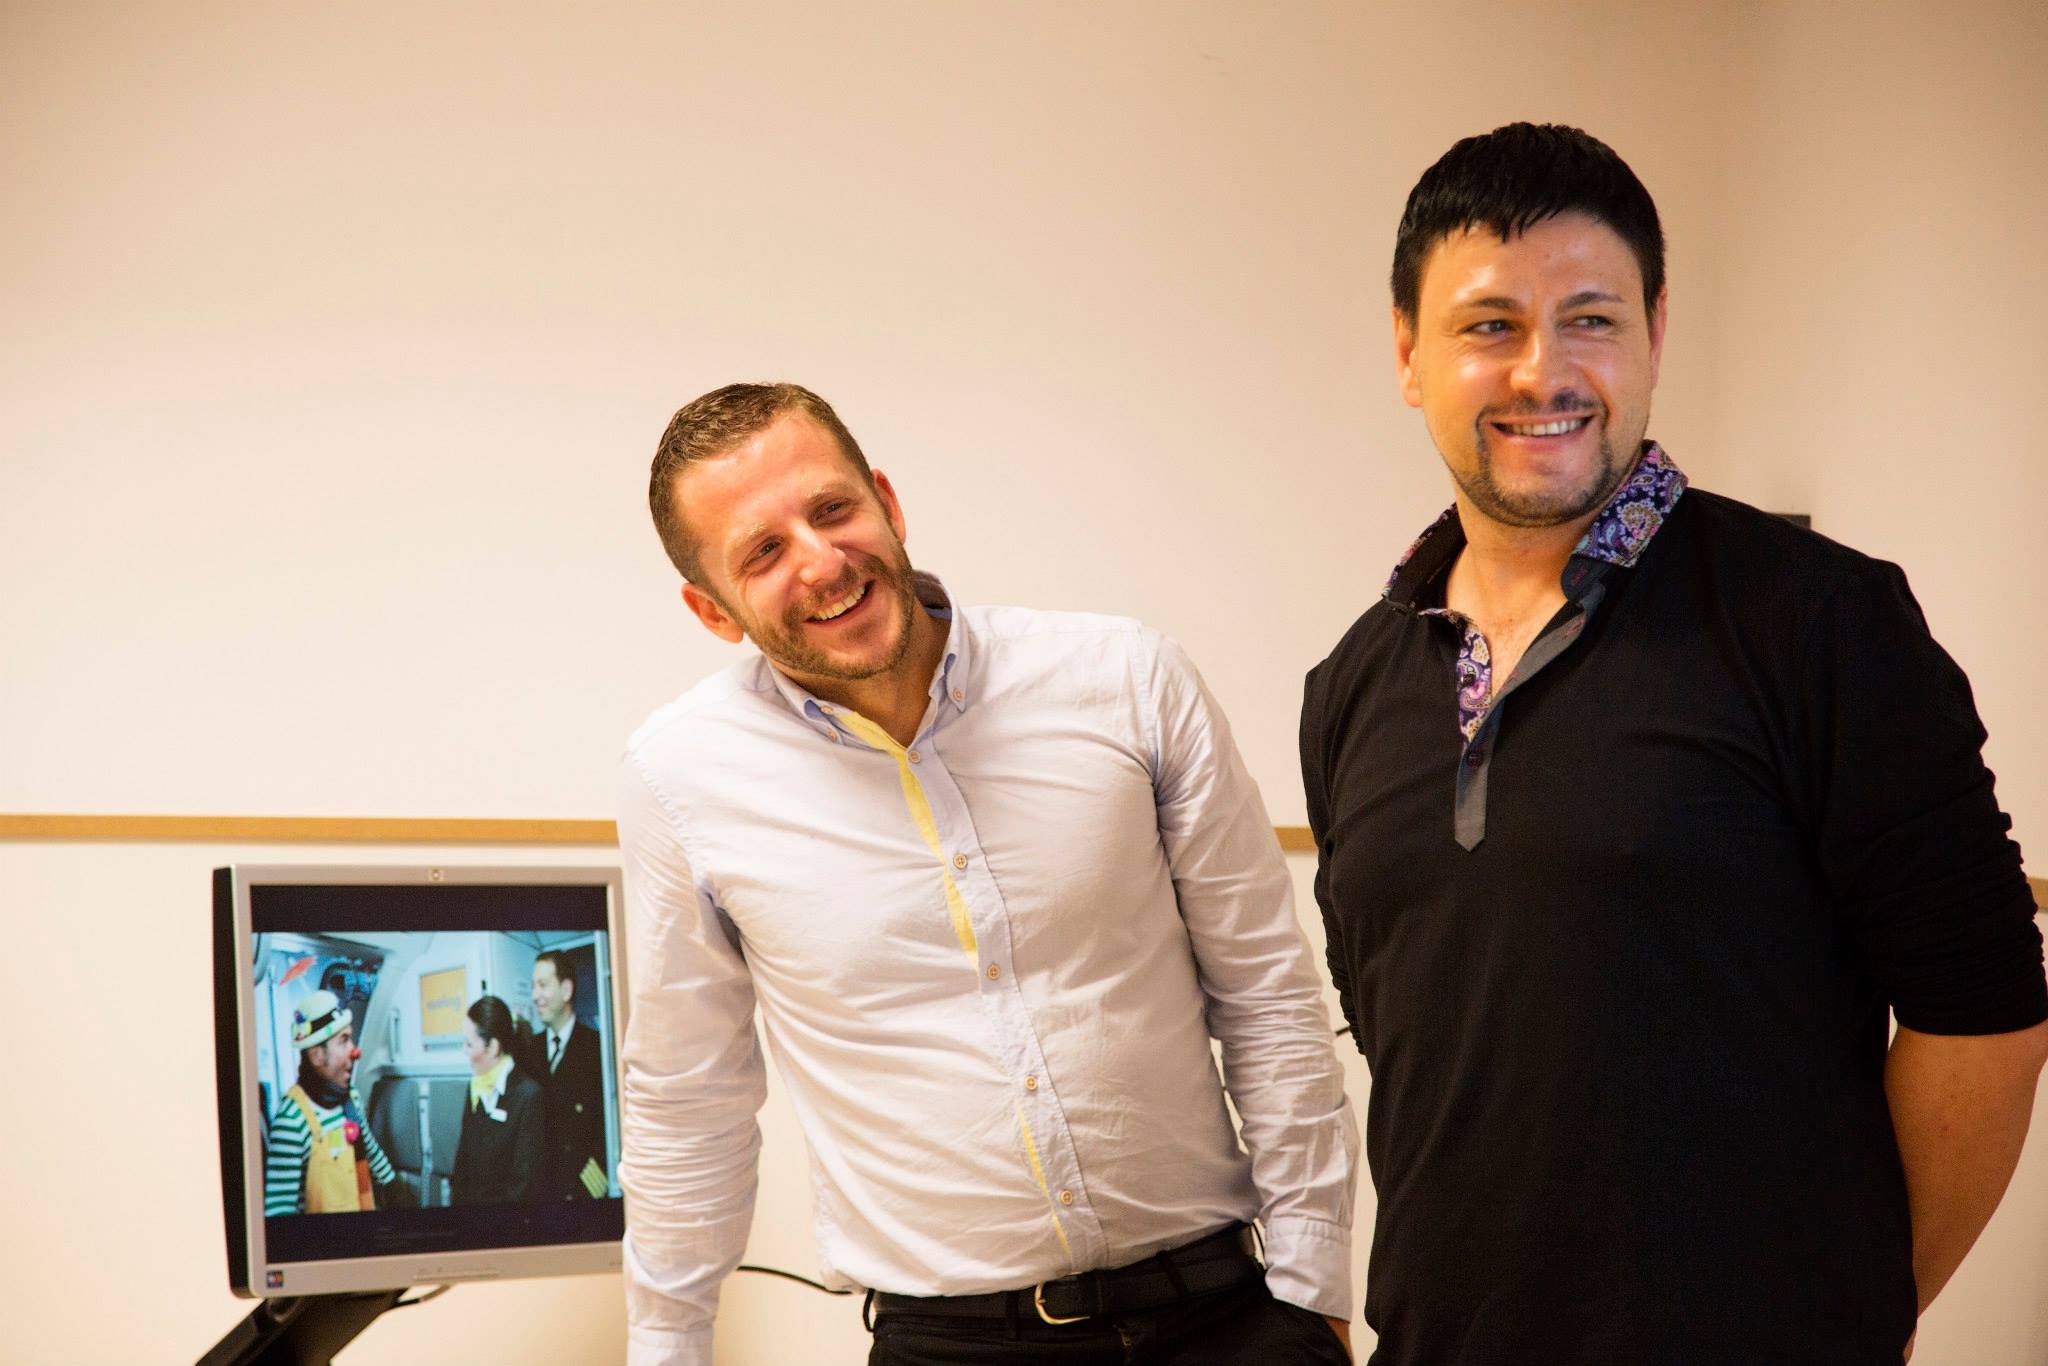 Matteo Nebiolo and Oscar Santamaria: Creativity in the Aviation Industry